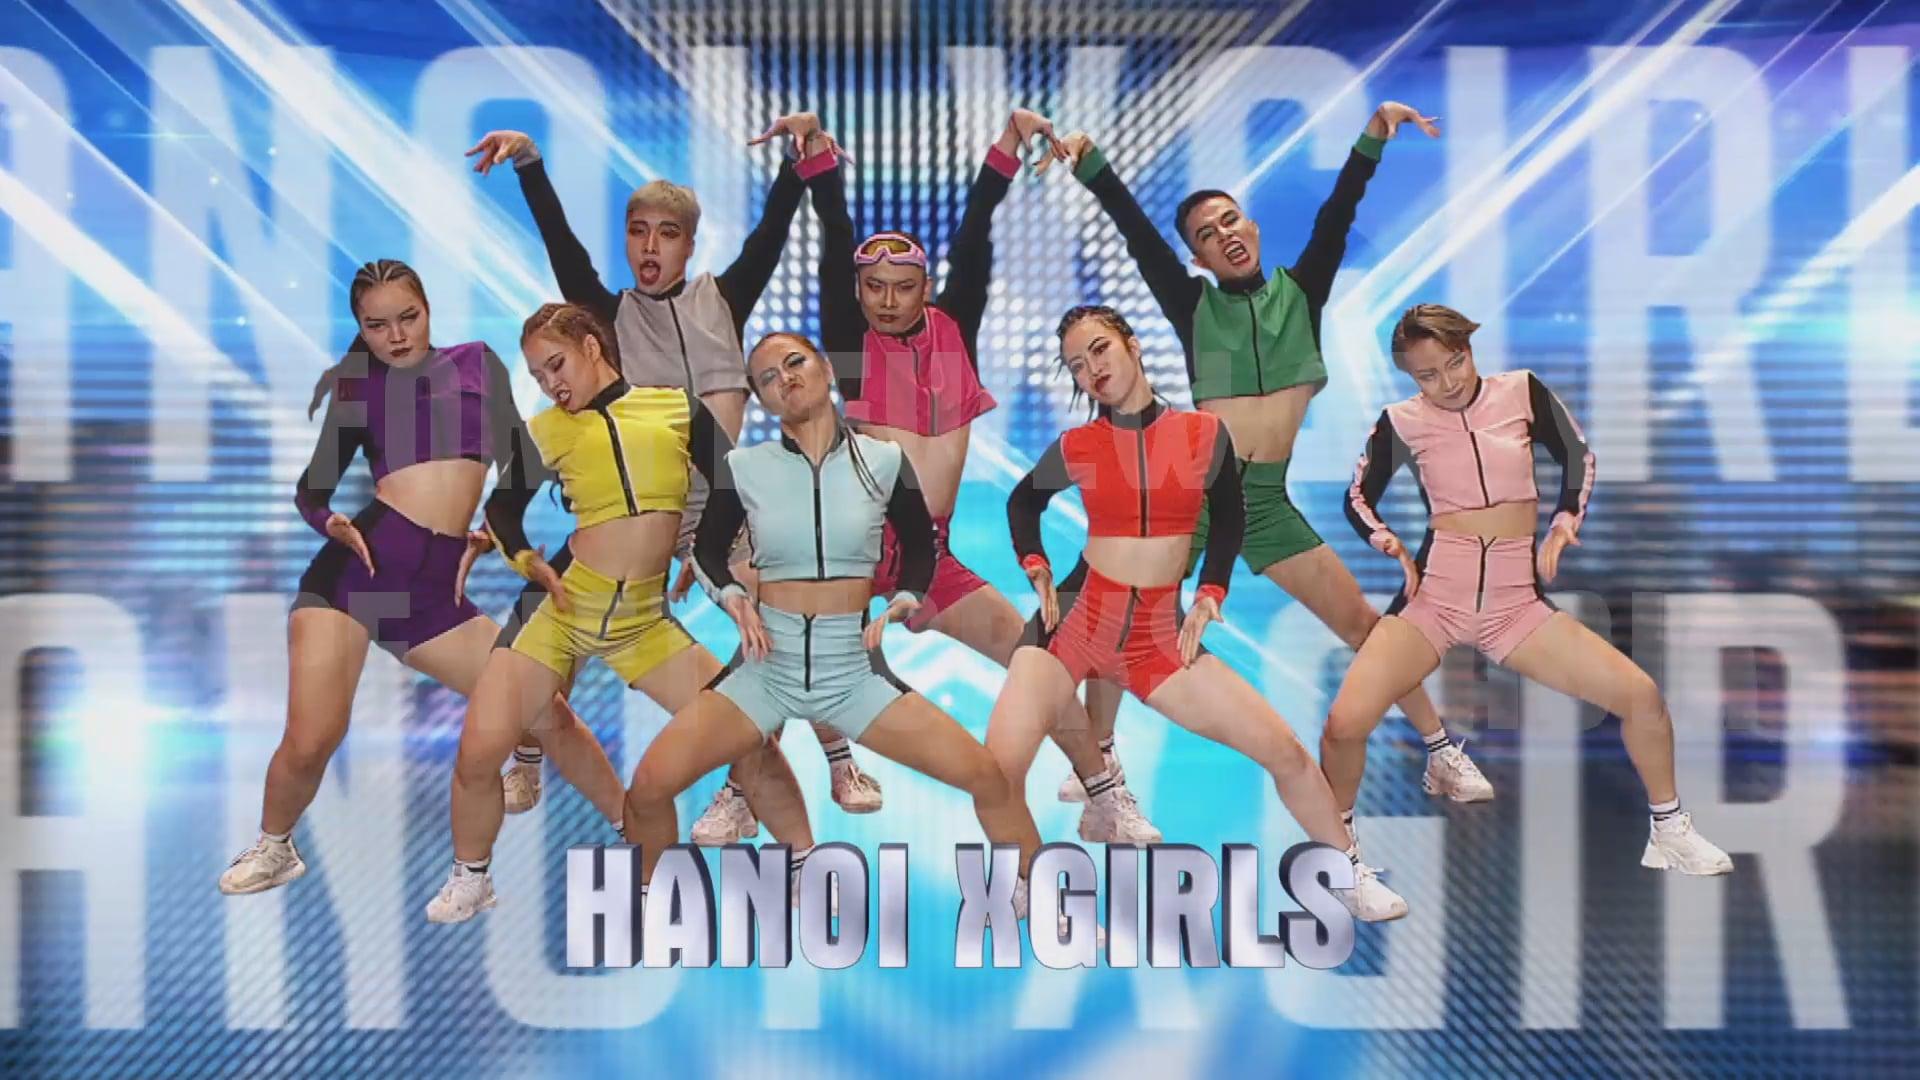 ASIA'S GOT TALENT S3 - Hanoi X Girls (2019)